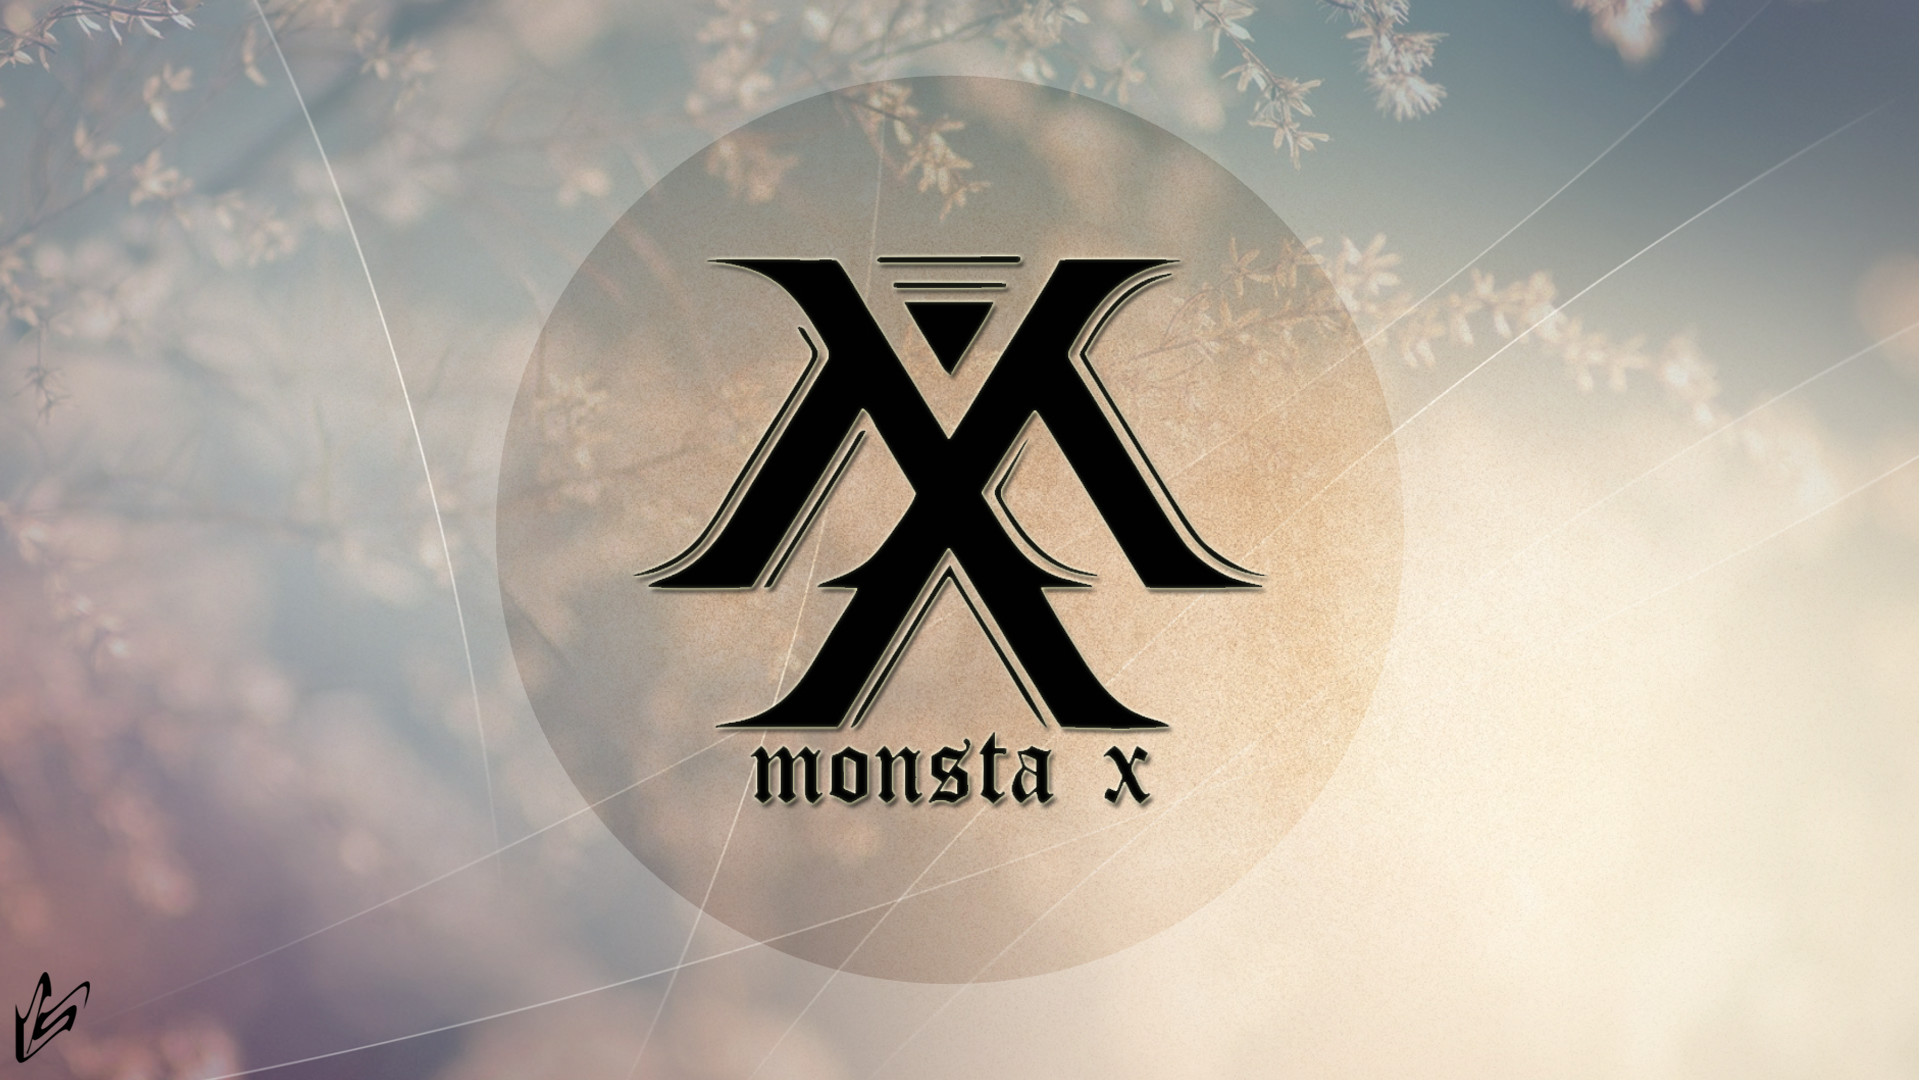 Monsta X Wallpapers 83 Images